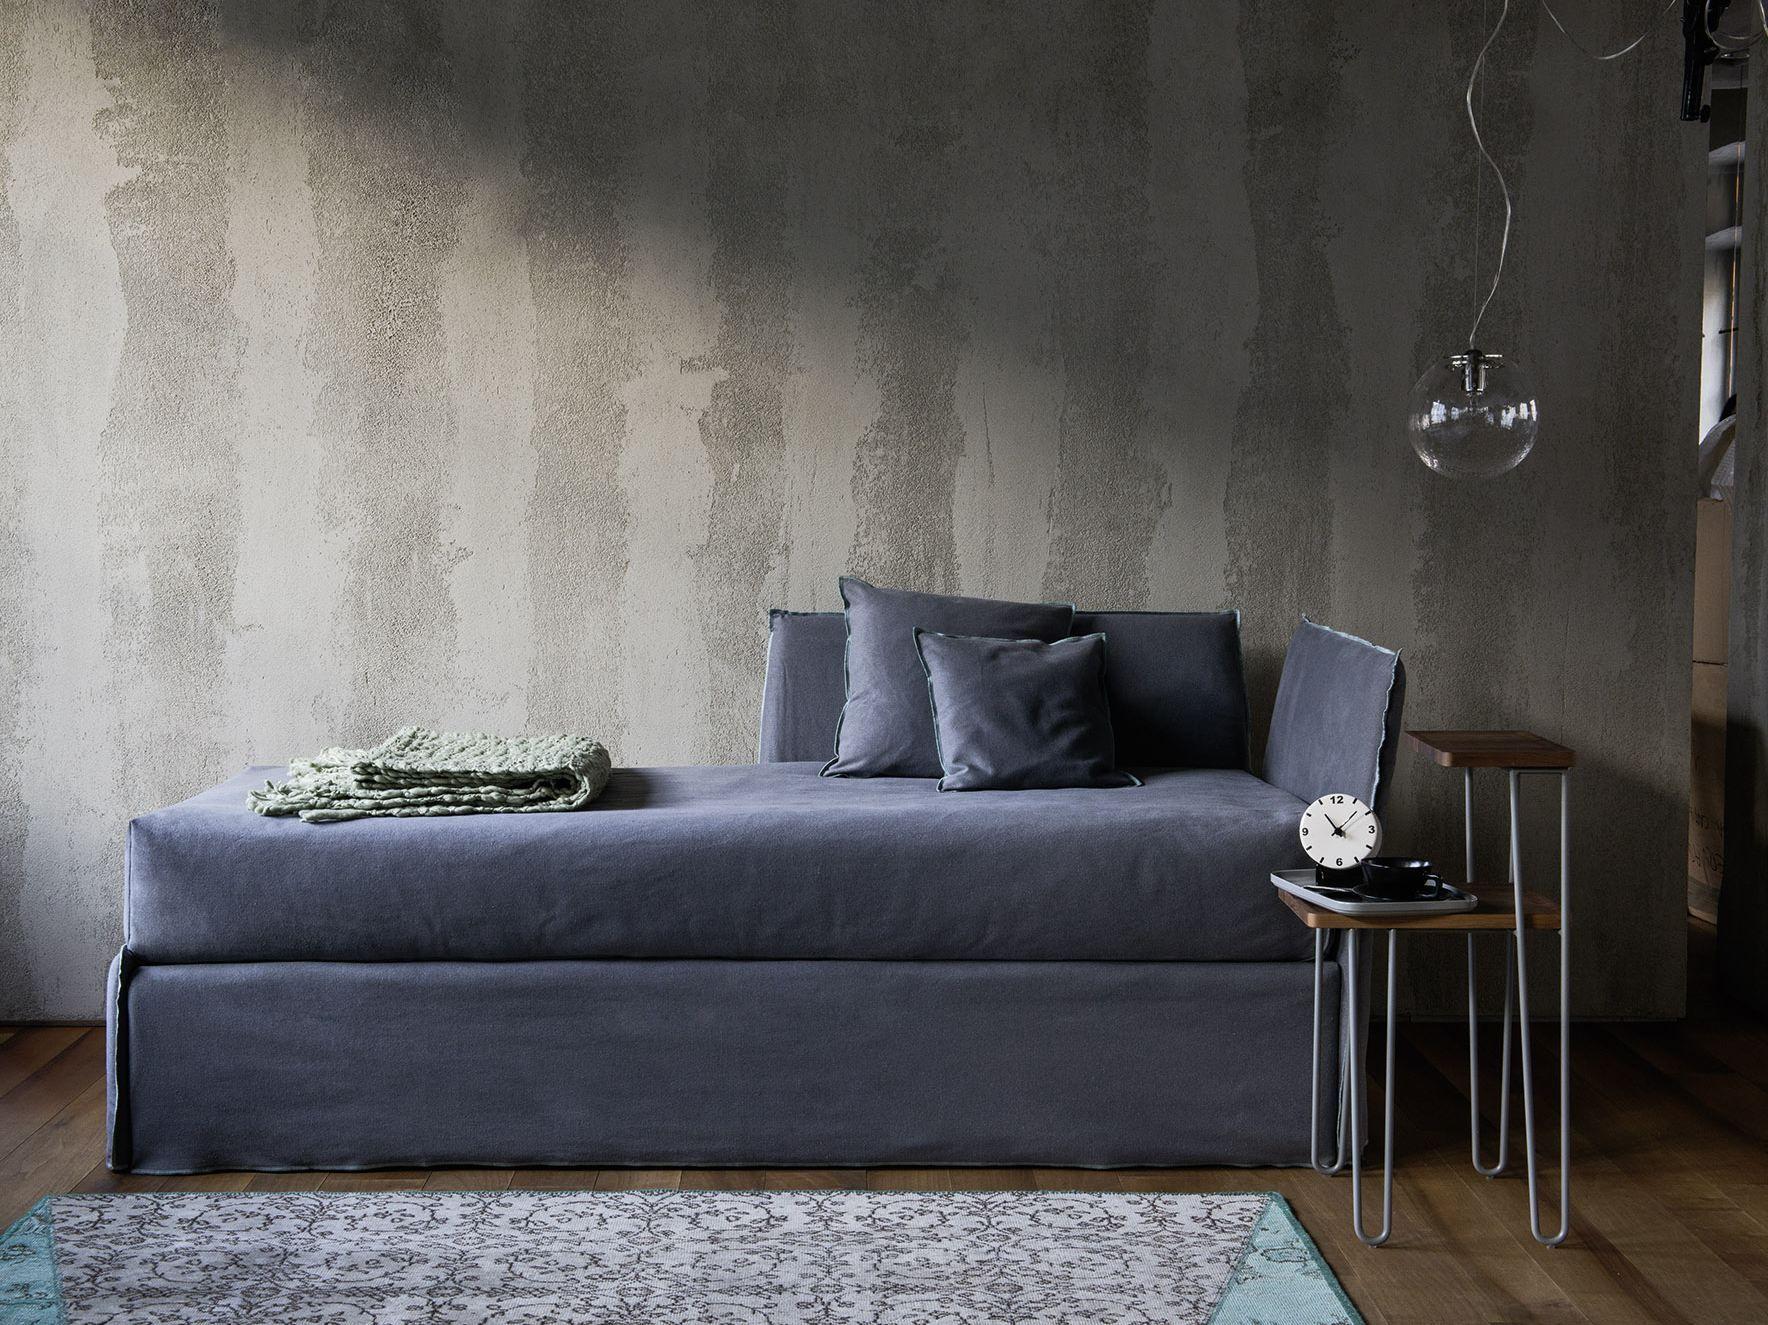 Convertible Sofa Bed Open 3 Letti Co Convertible Sofa Bed Sofa Sofa Bed